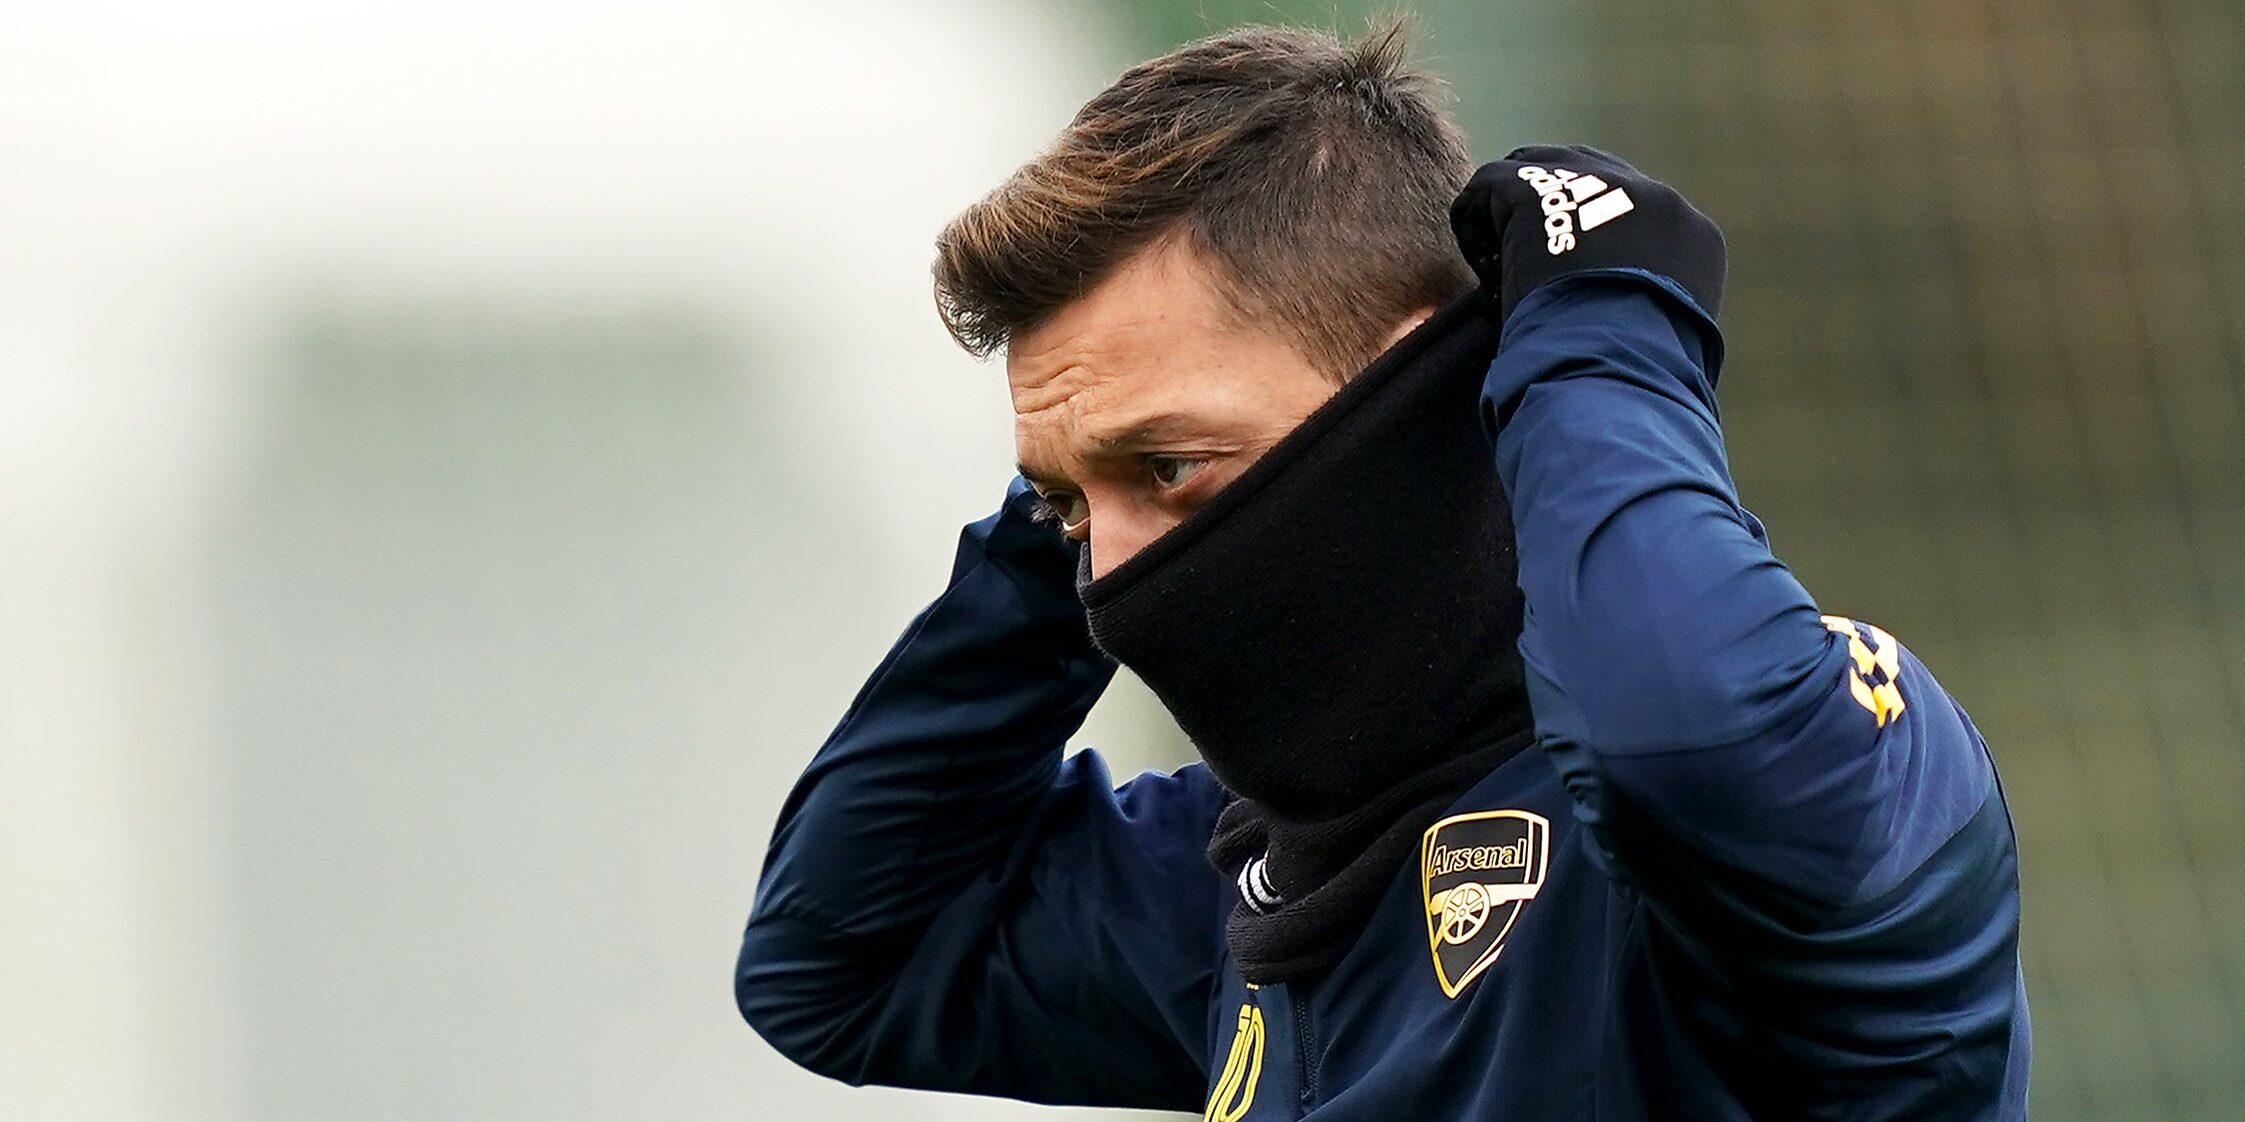 Mesut Özil, durant la seva etapa a l'Arsenal   Europa Press